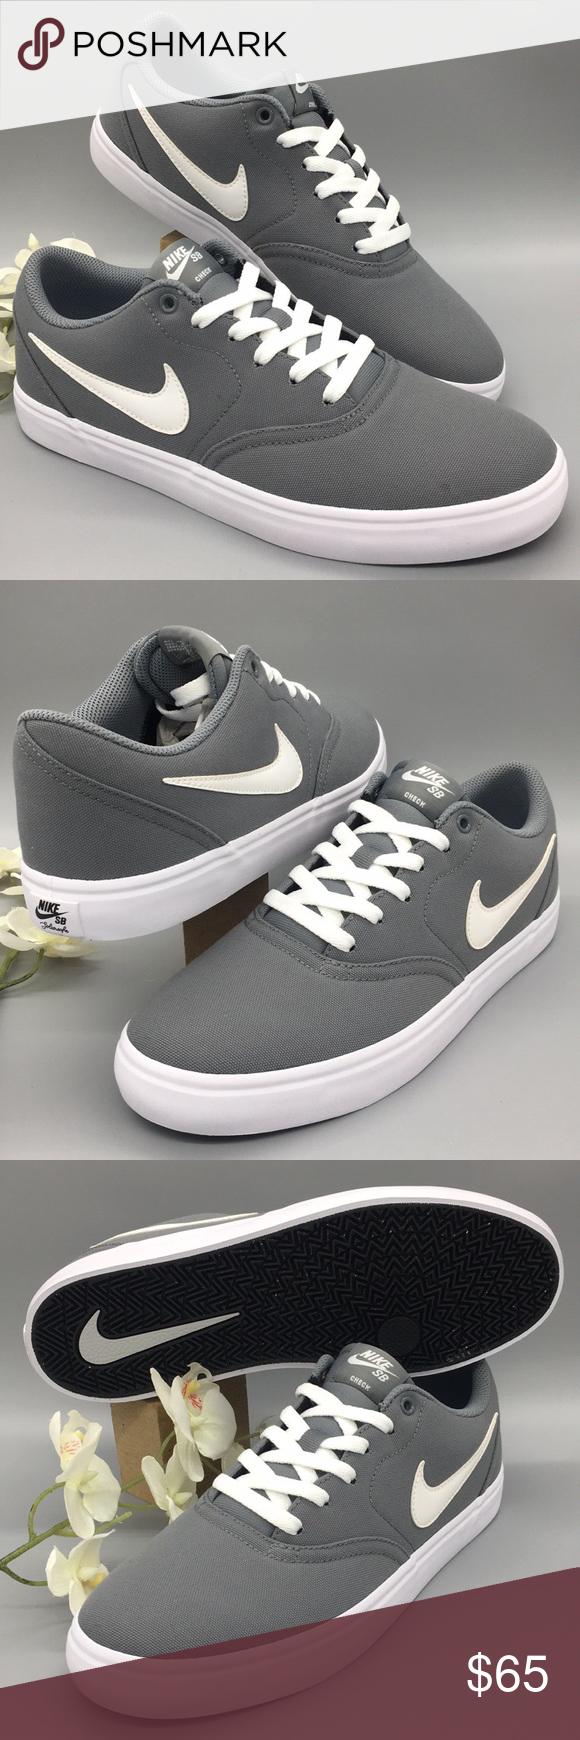 Nike Sb Check Solar Cnvs W Nike Sb Womens Shoes Sneakers Nike